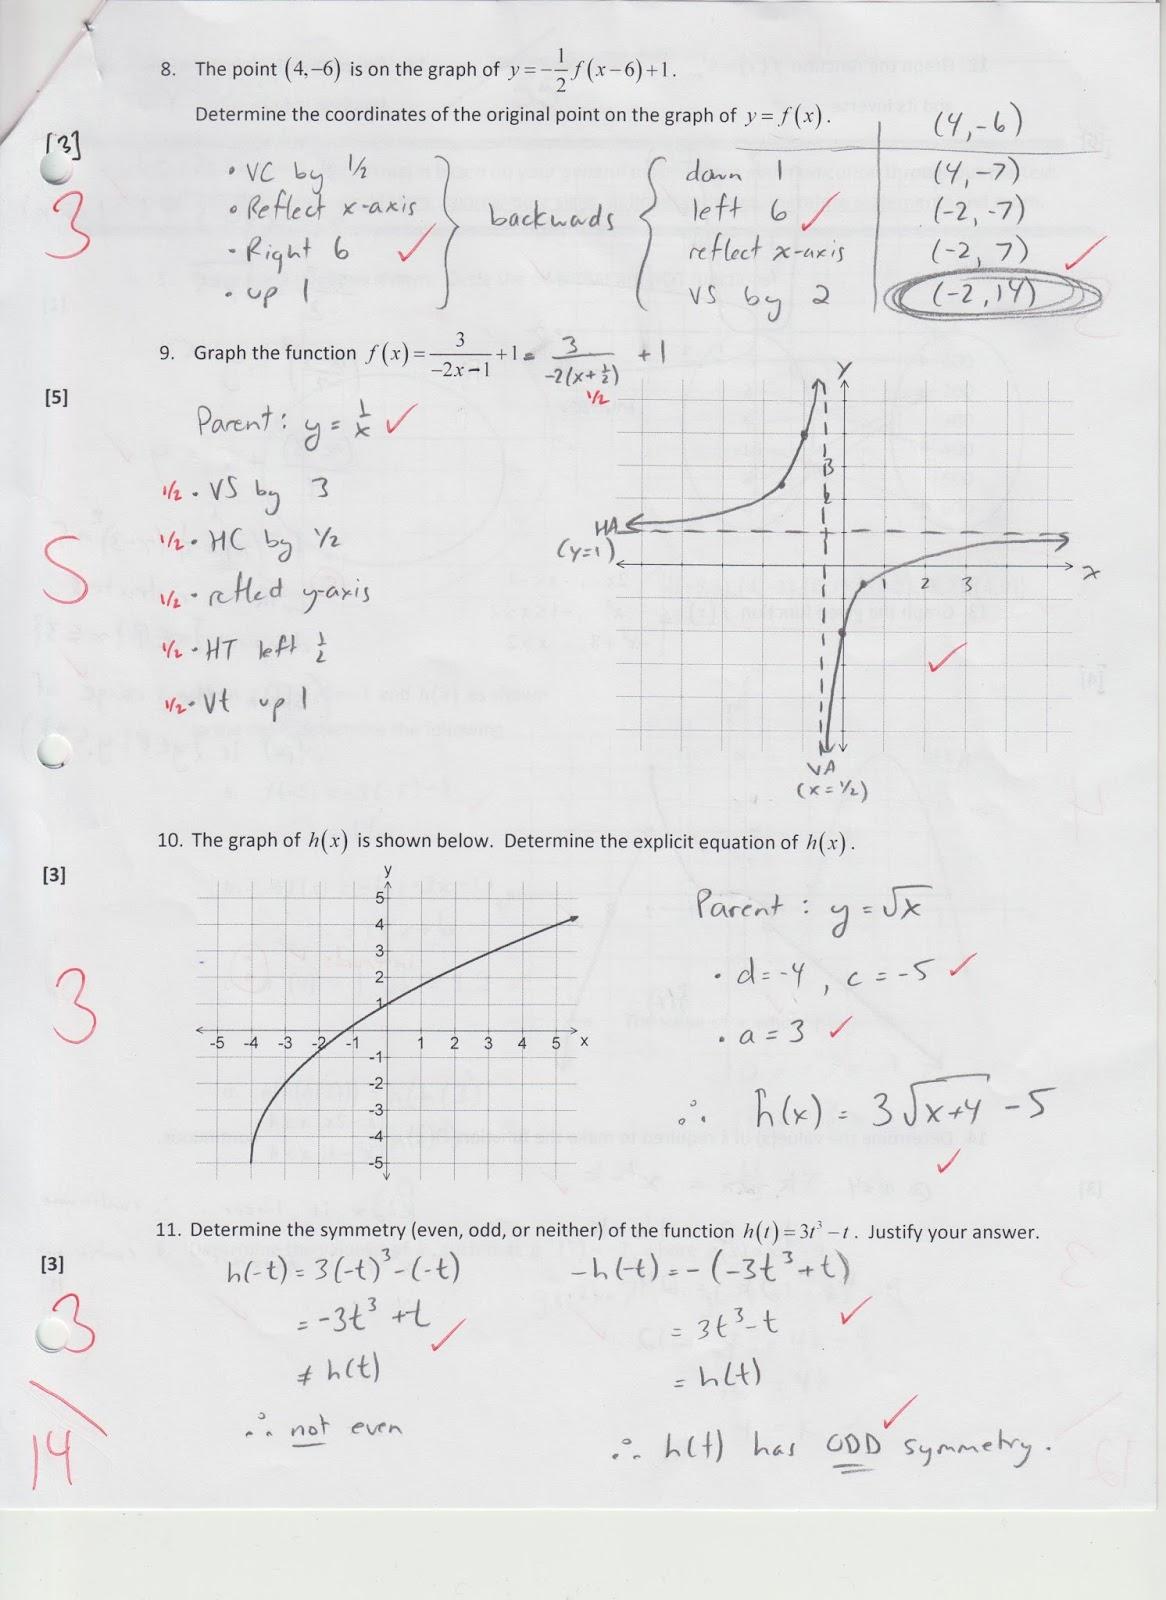 Grade 11 pre-AP Math: Test Solutions